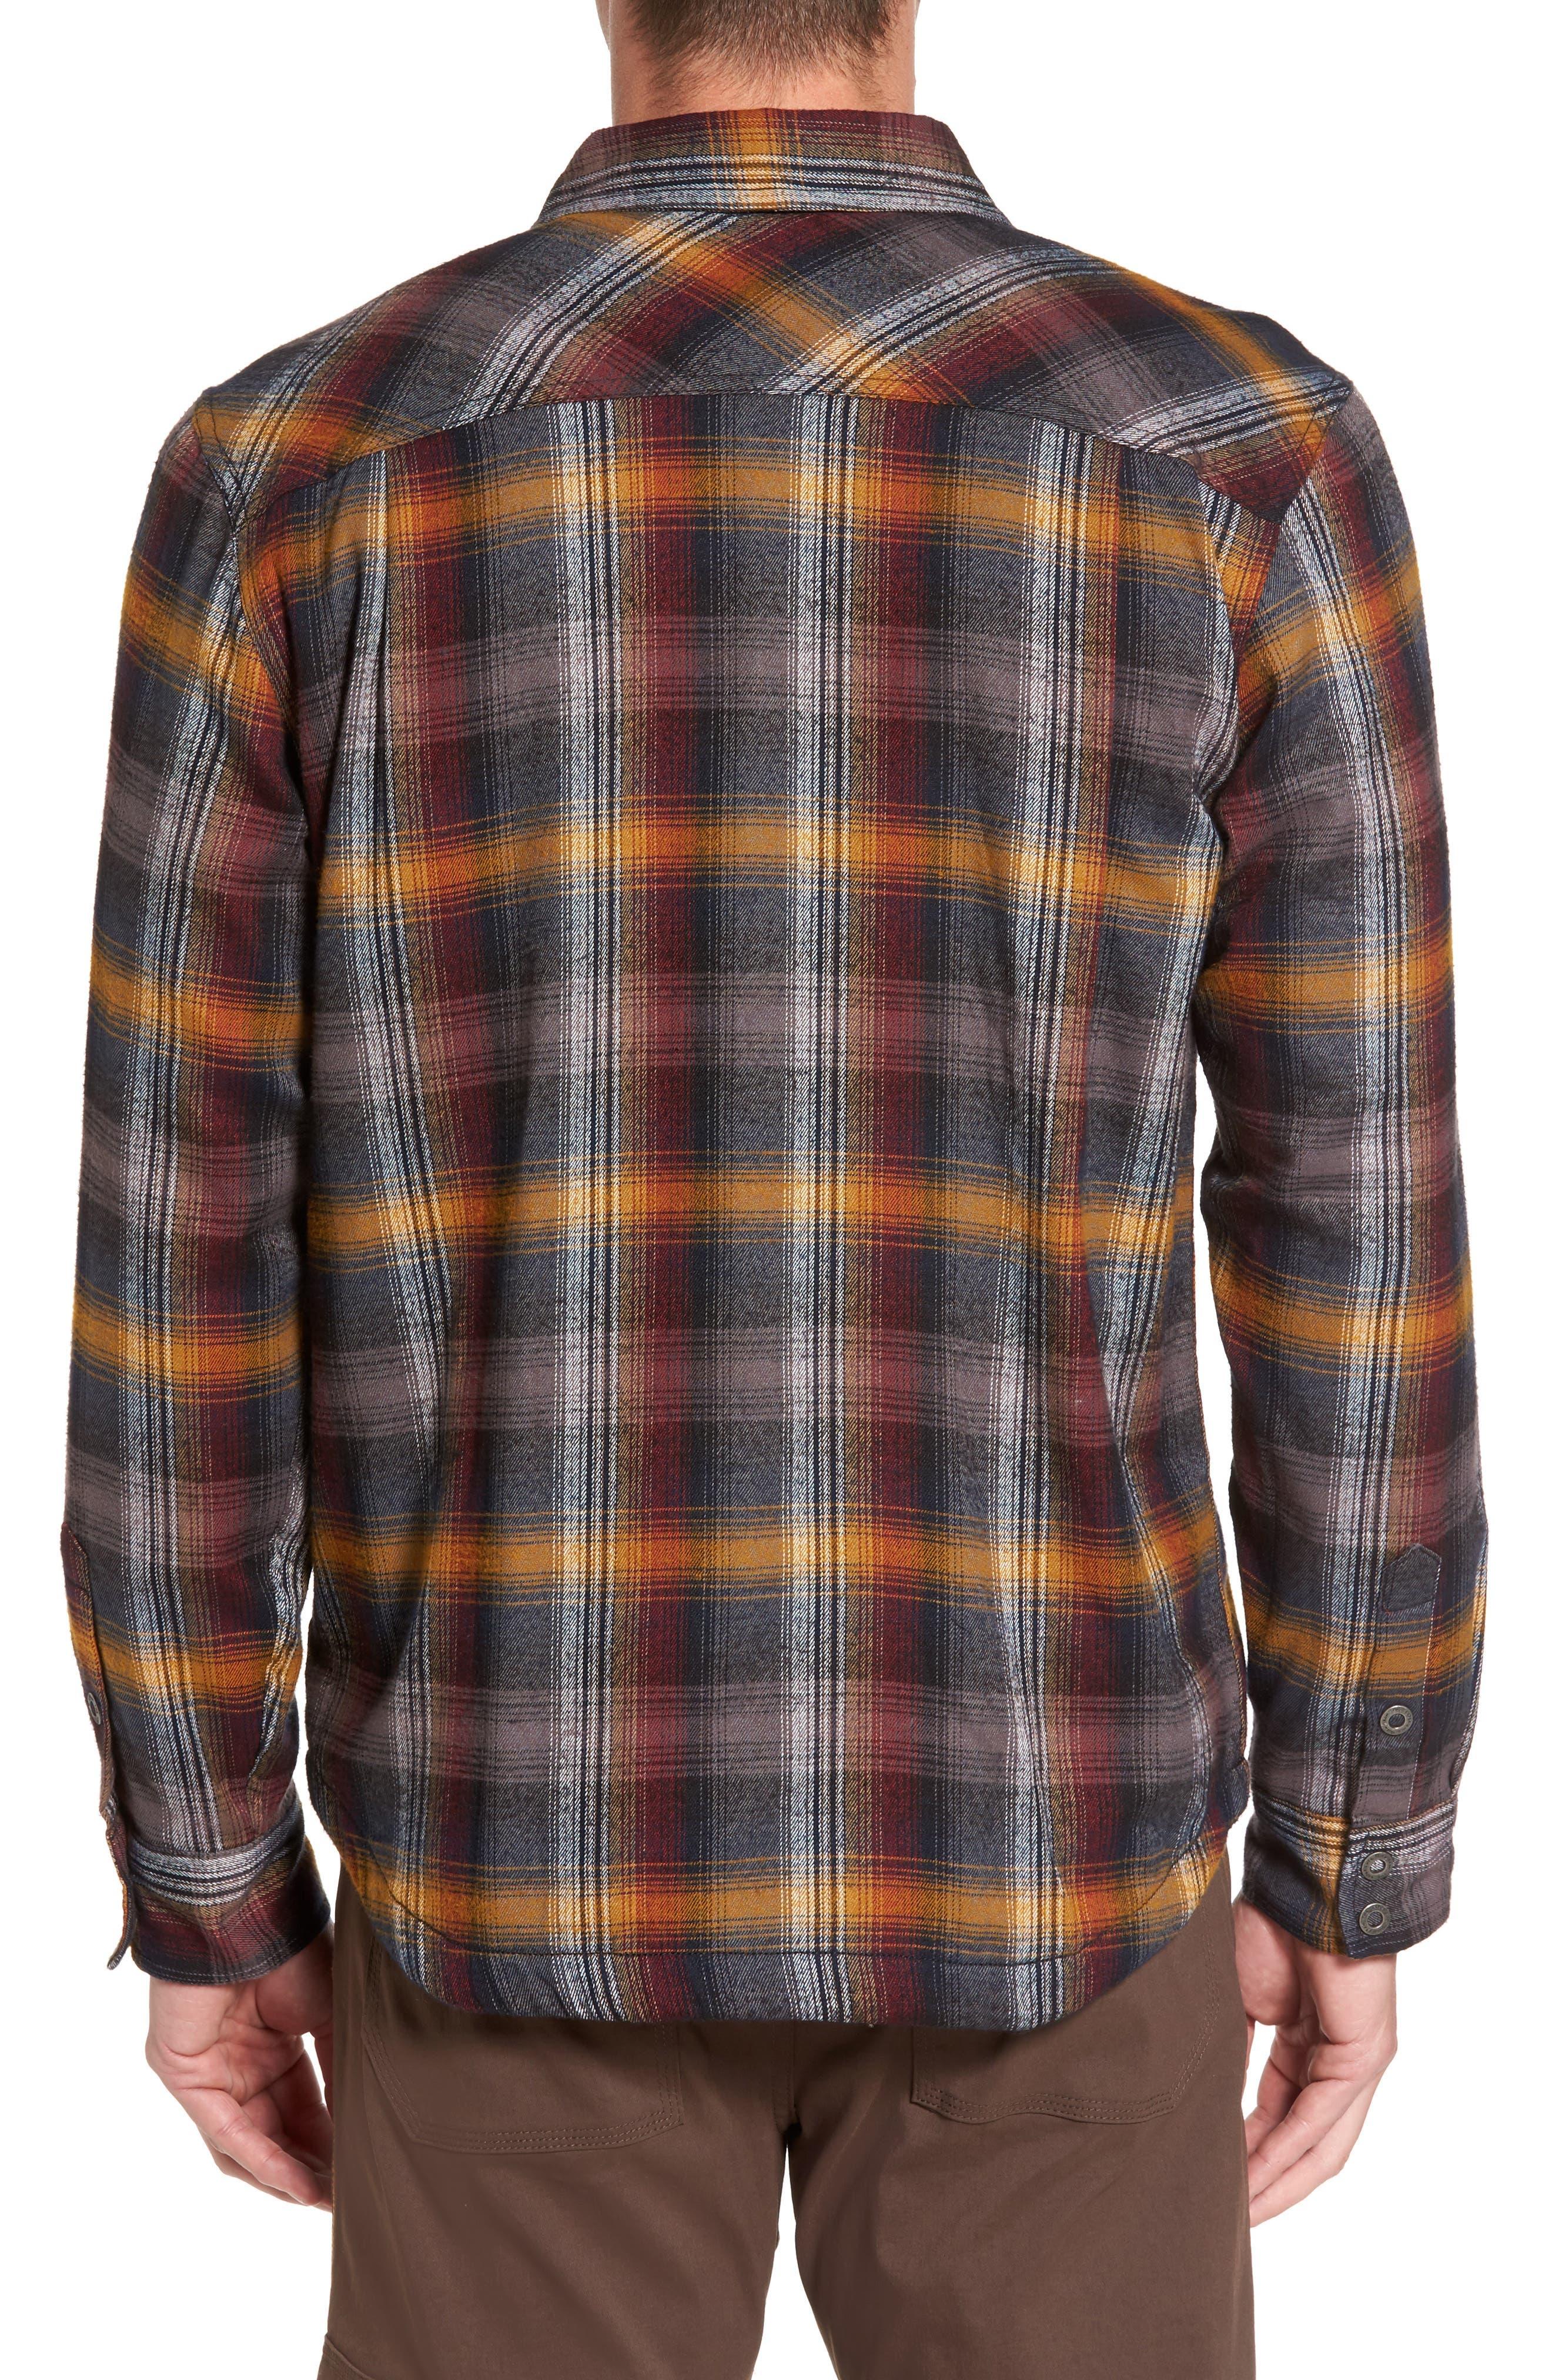 Asylum Regular Fit Plaid Shirt Jacket,                             Alternate thumbnail 2, color,                             Black